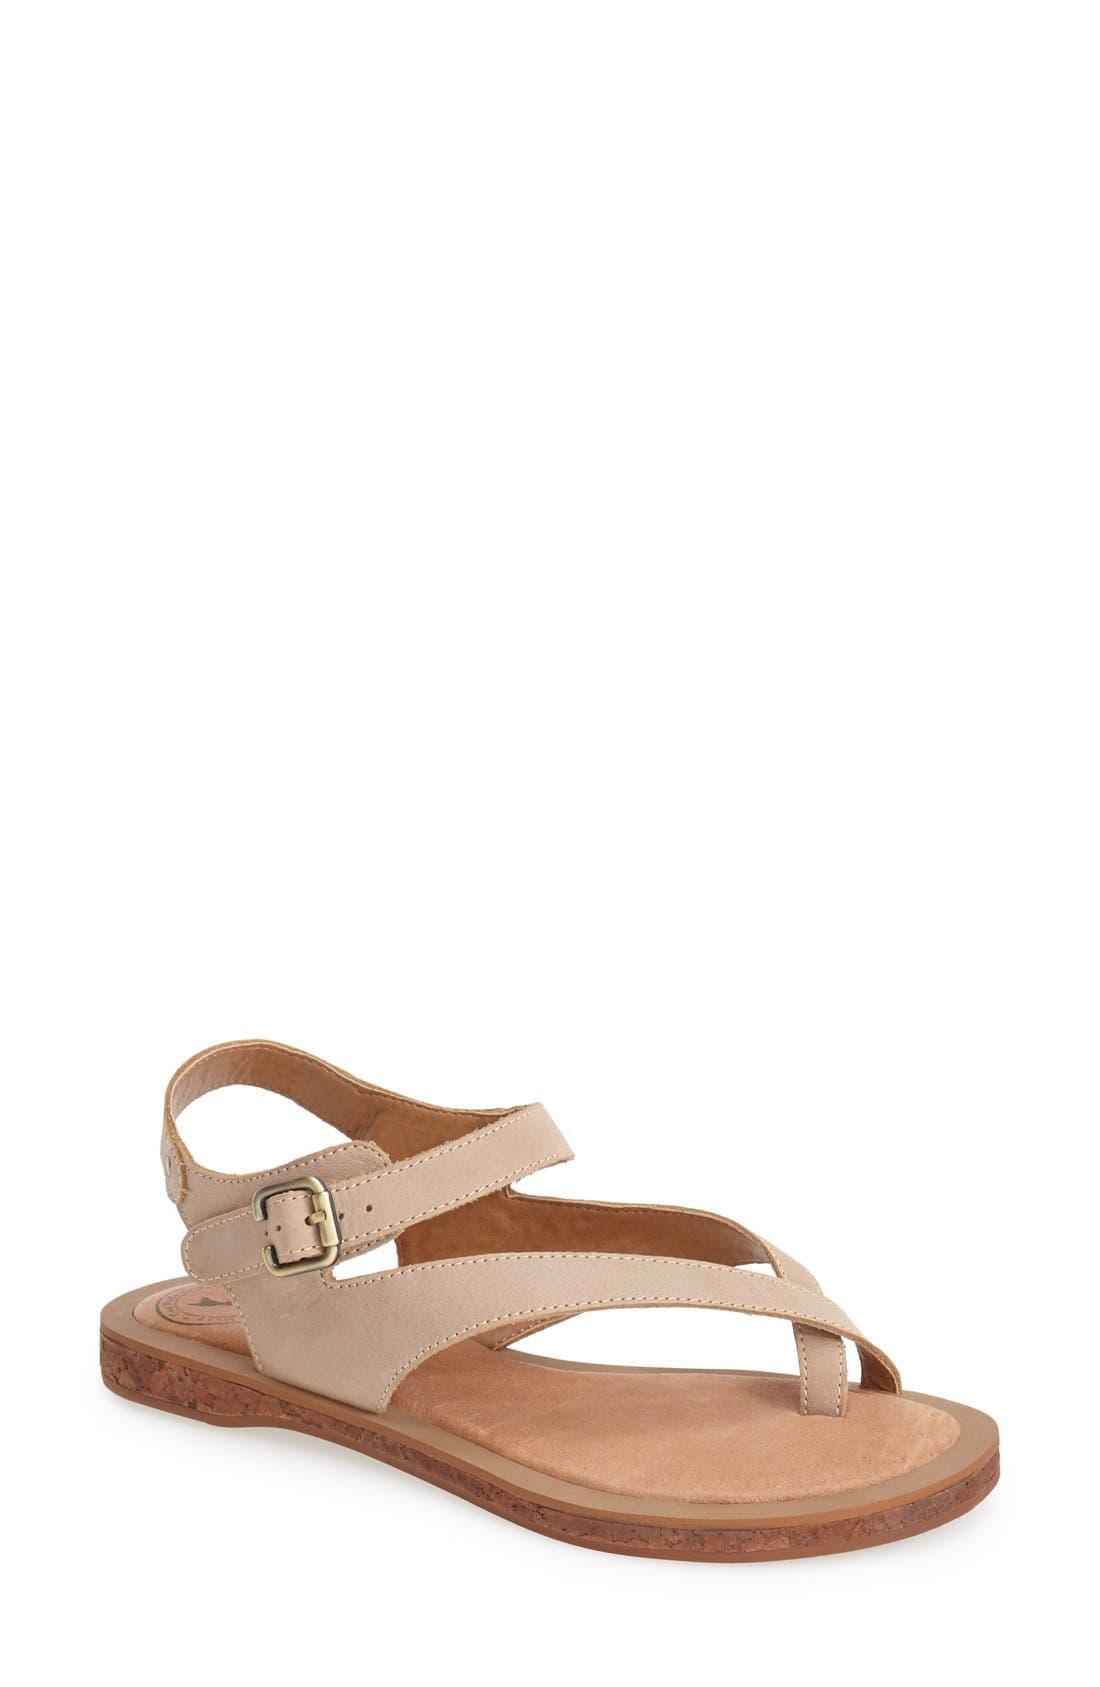 Alternate Image 1 Selected - Gee WaWa 'Montana' Leather Sandal (Women)